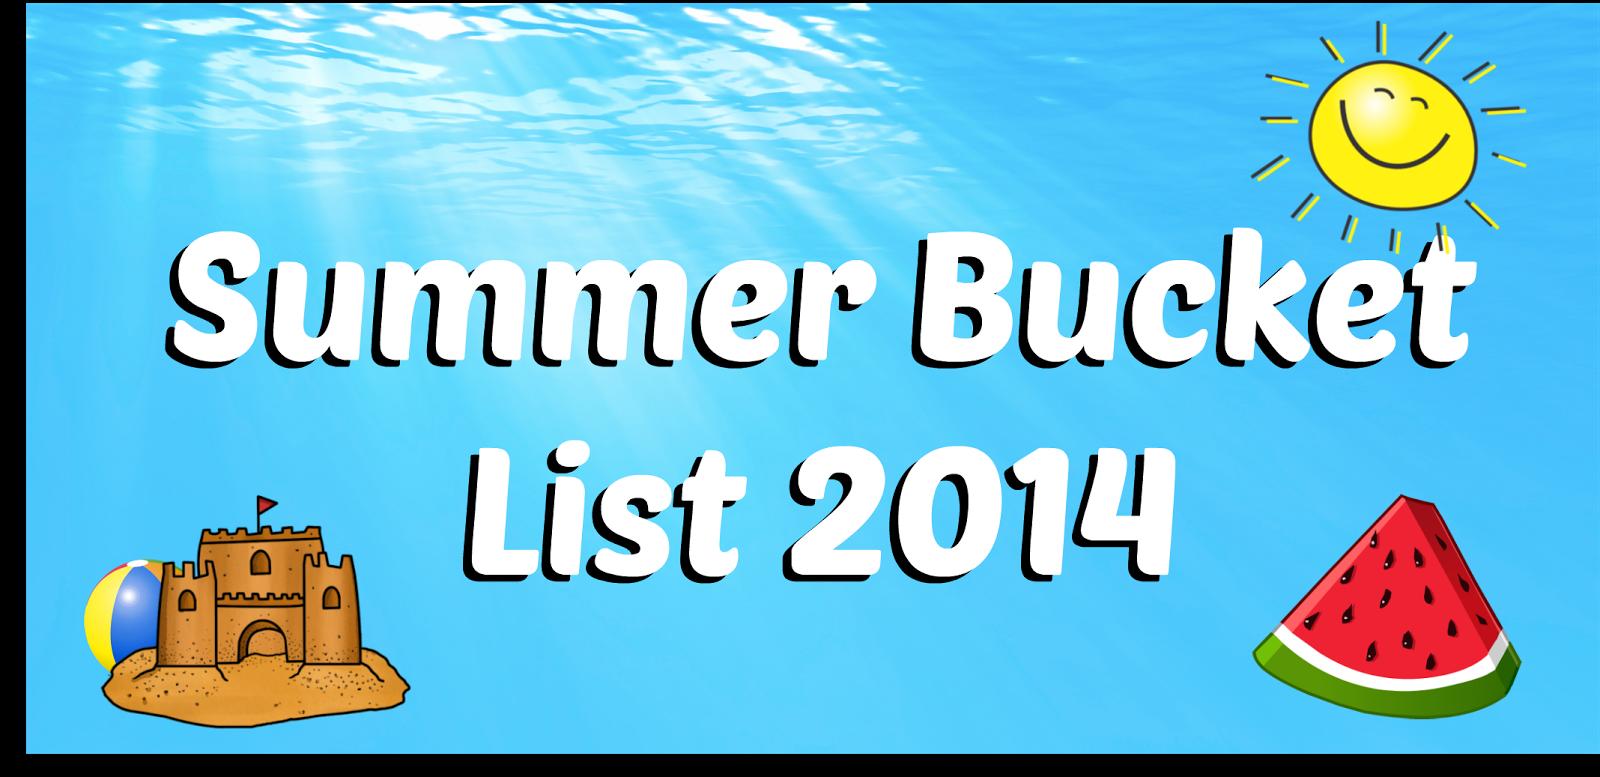 http://timeforseason.blogspot.com/2014/05/bucket-list-for-summer.html